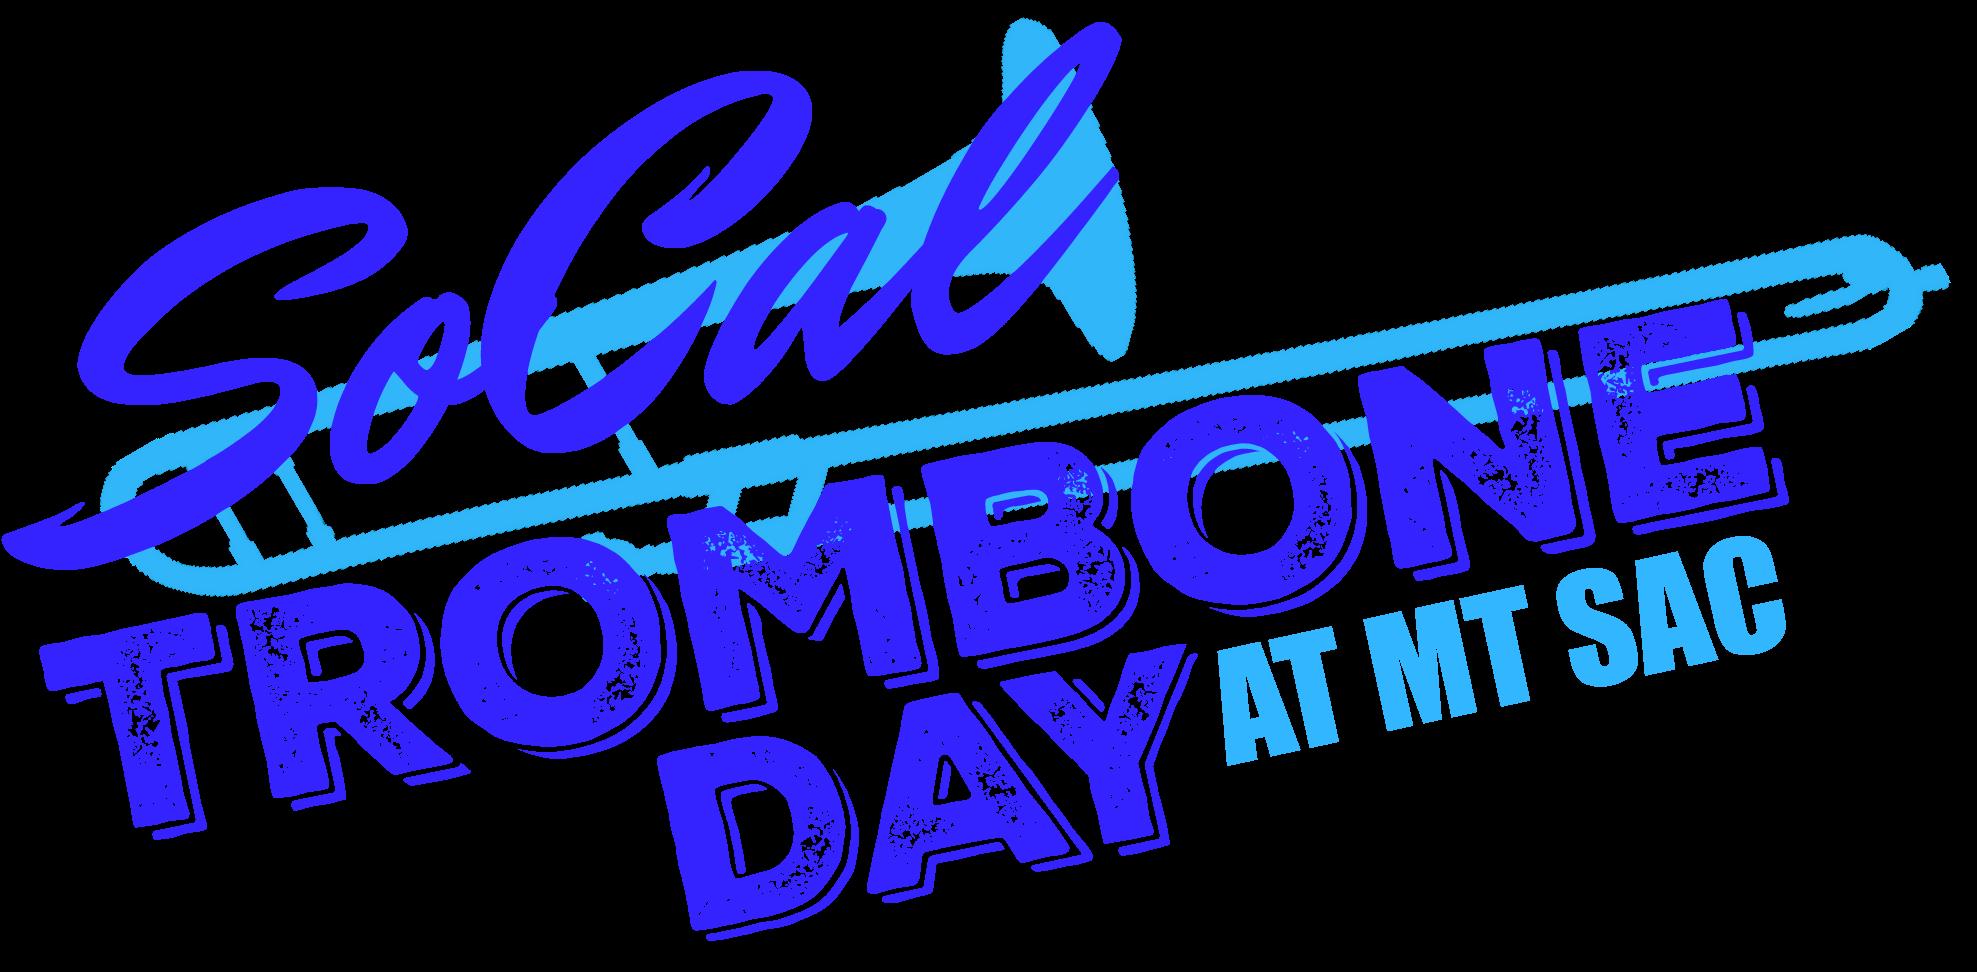 SoCal Trombone Day